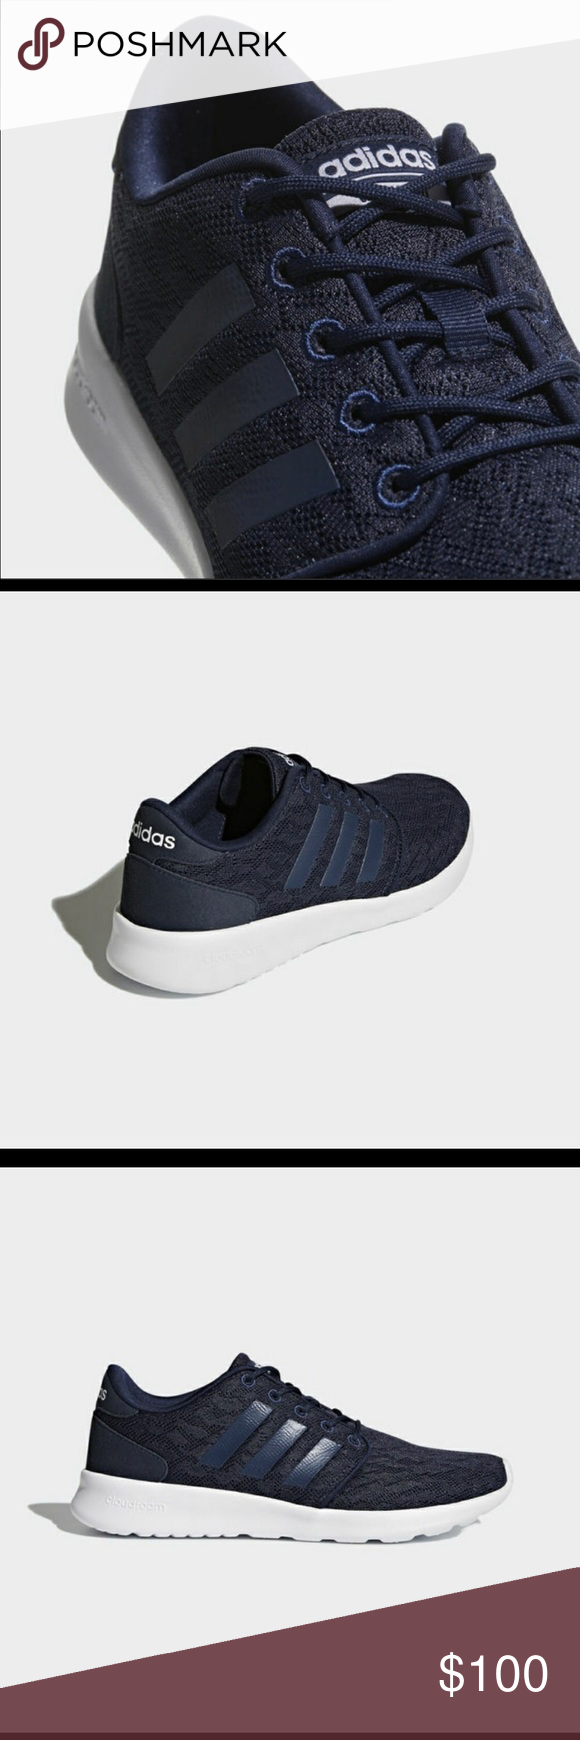 Adidas cloudfoam qt racer shoes BB9846 Adidas women s shoes adidas Shoes  Athletic Shoes 260ac5d6f